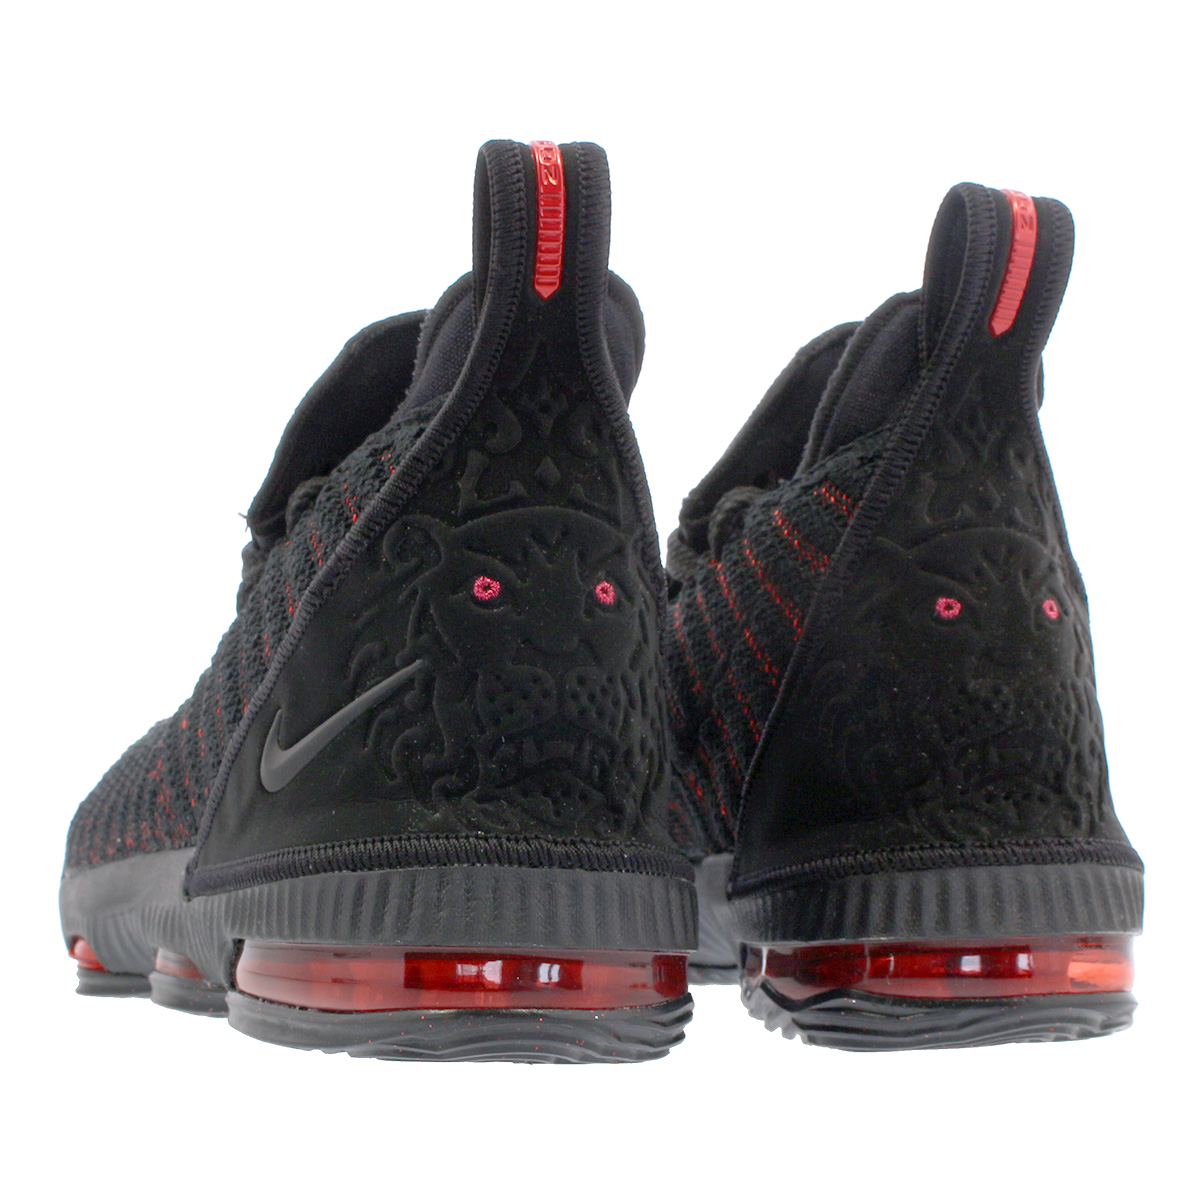 best cheap bc5ad 3e2ce NIKE LEBRON 16 GS Nike Revlon 16 GS BLACK/UNIVERSITY RED aq2465-002